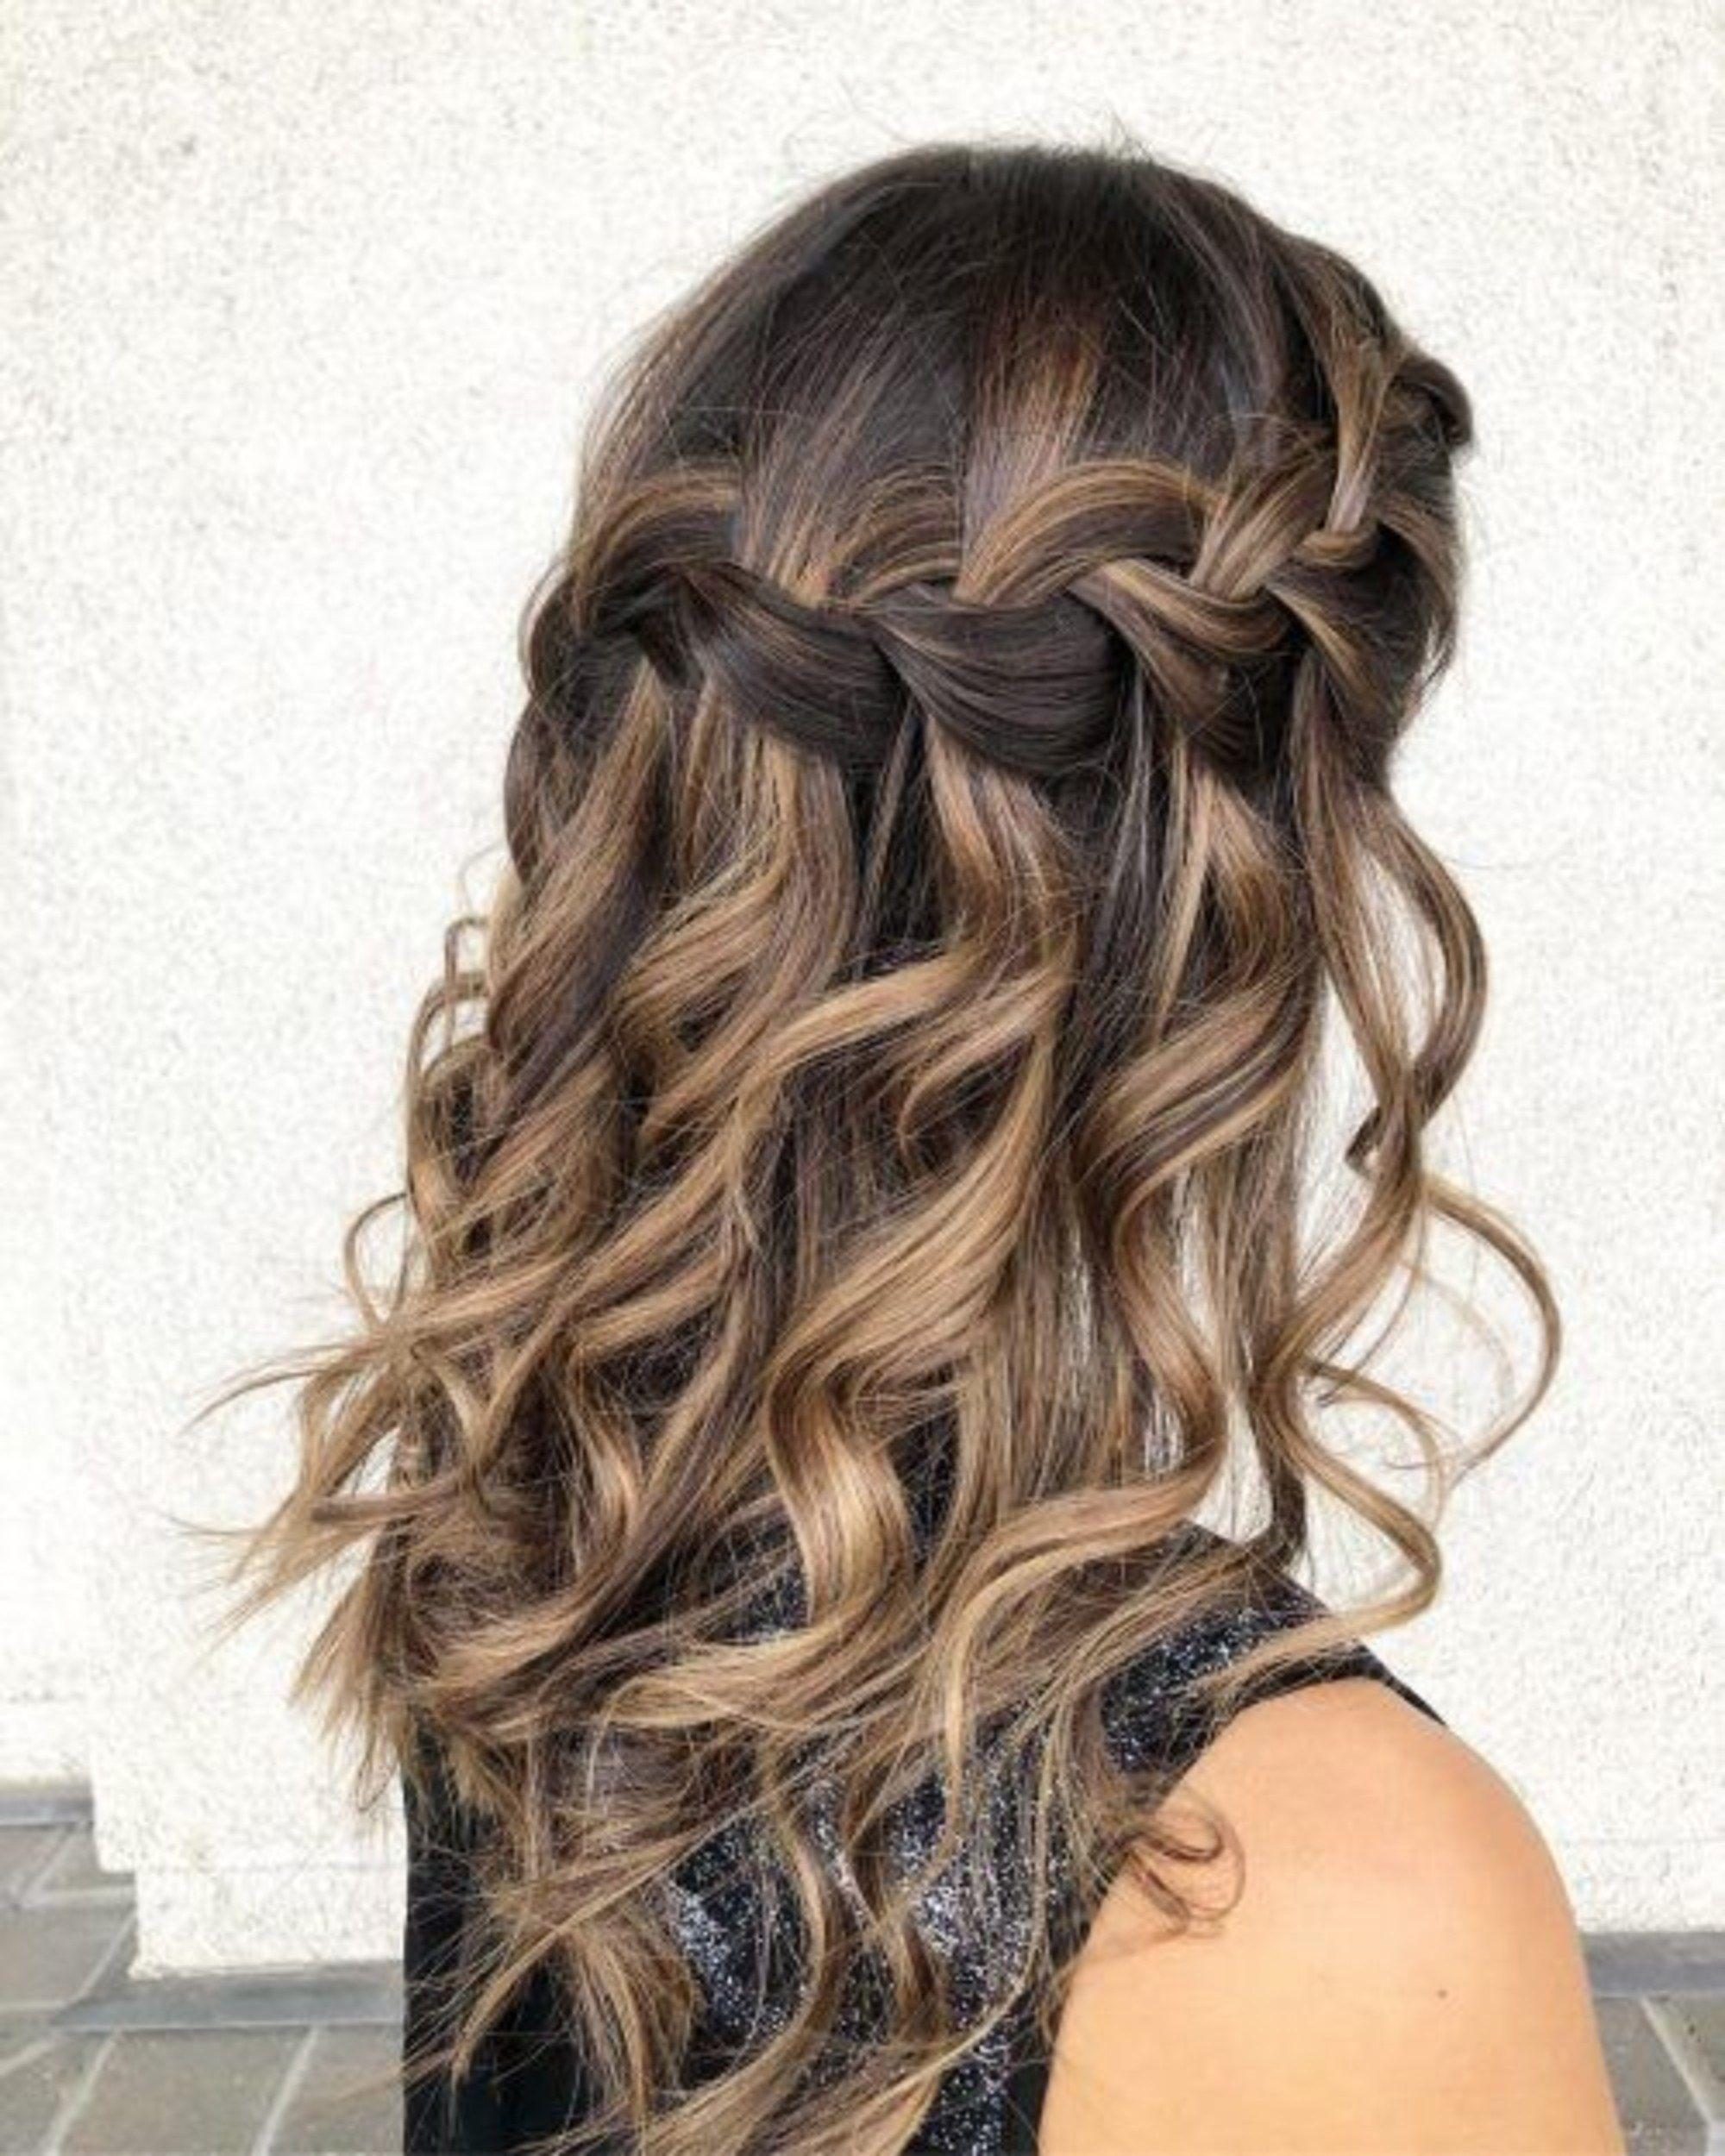 Top 25 Graduation Hairstyles Hd Wallpapers Hair Styles Prom Hair Down Cute Prom Hairstyles